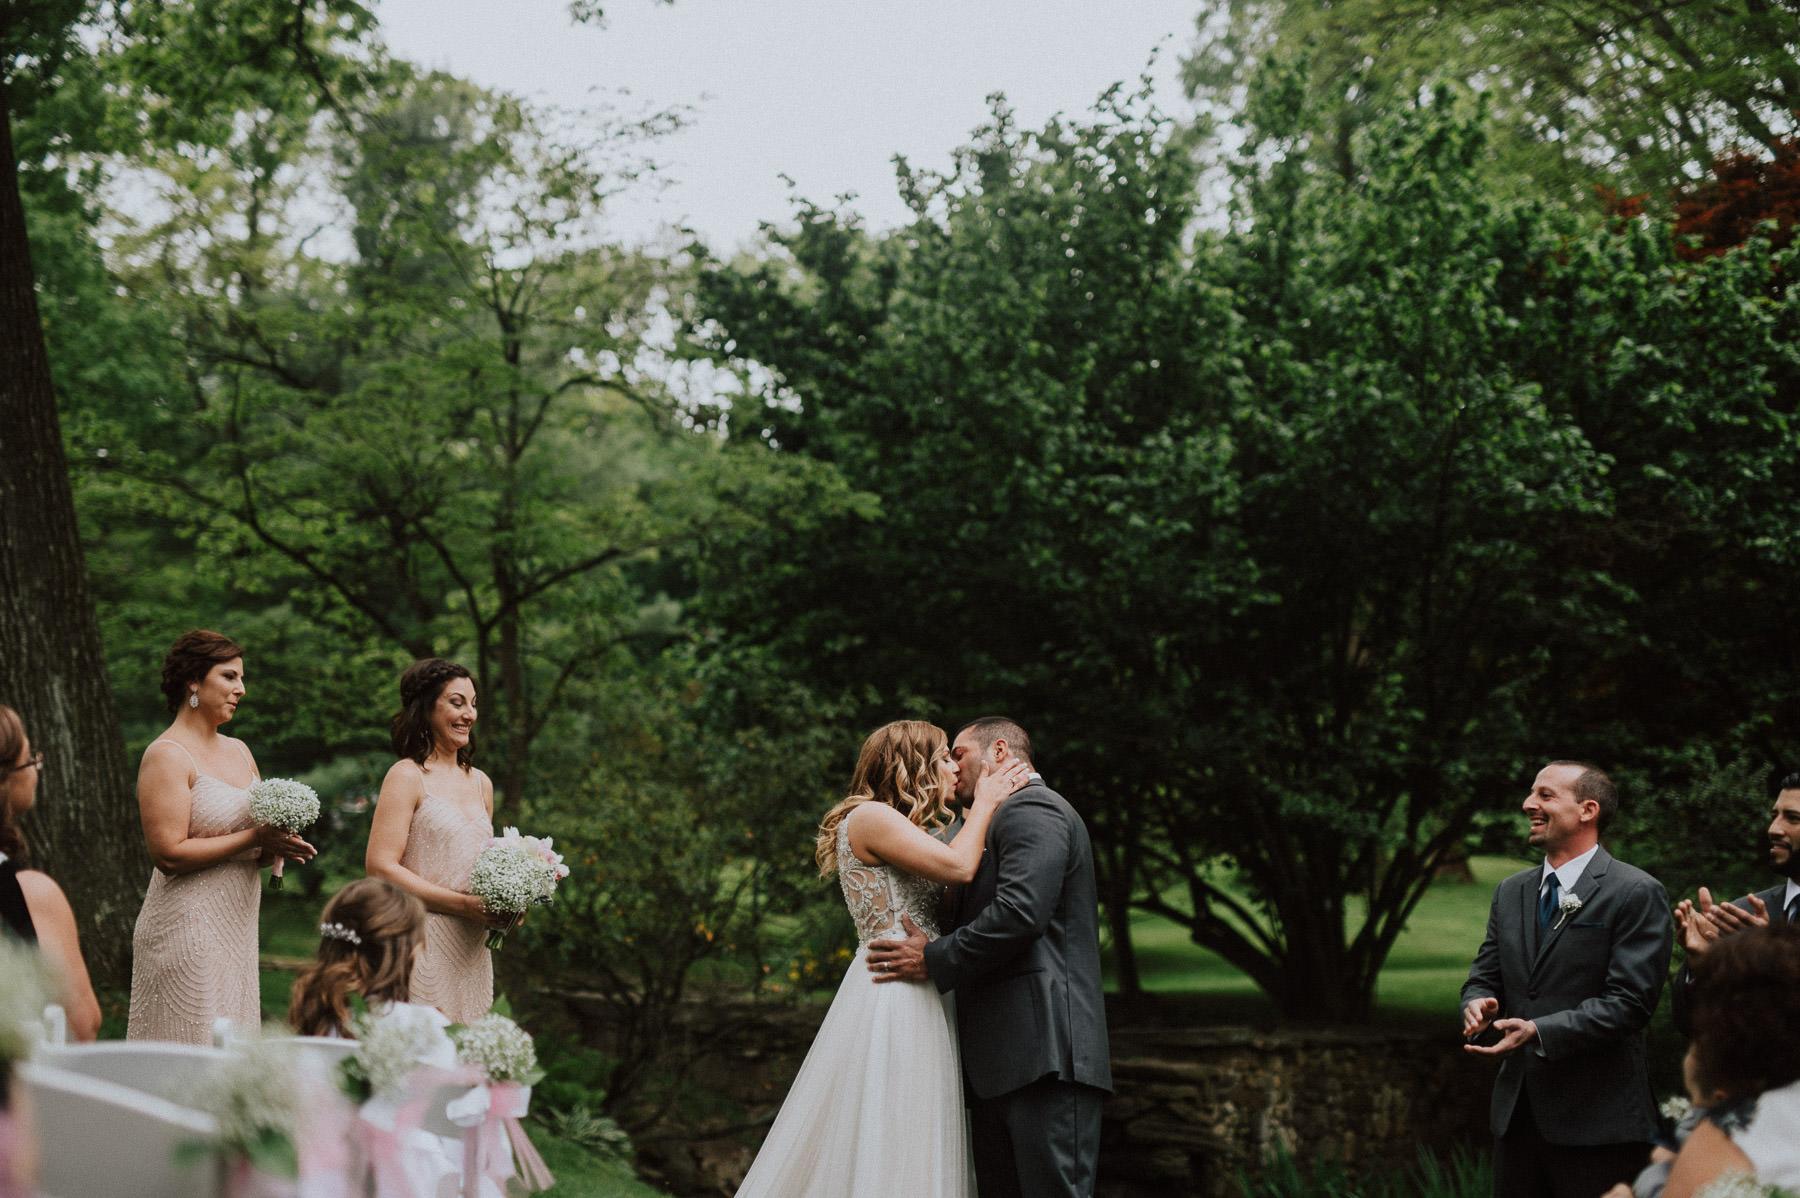 appleford-estate-wedding-photography-67.jpg